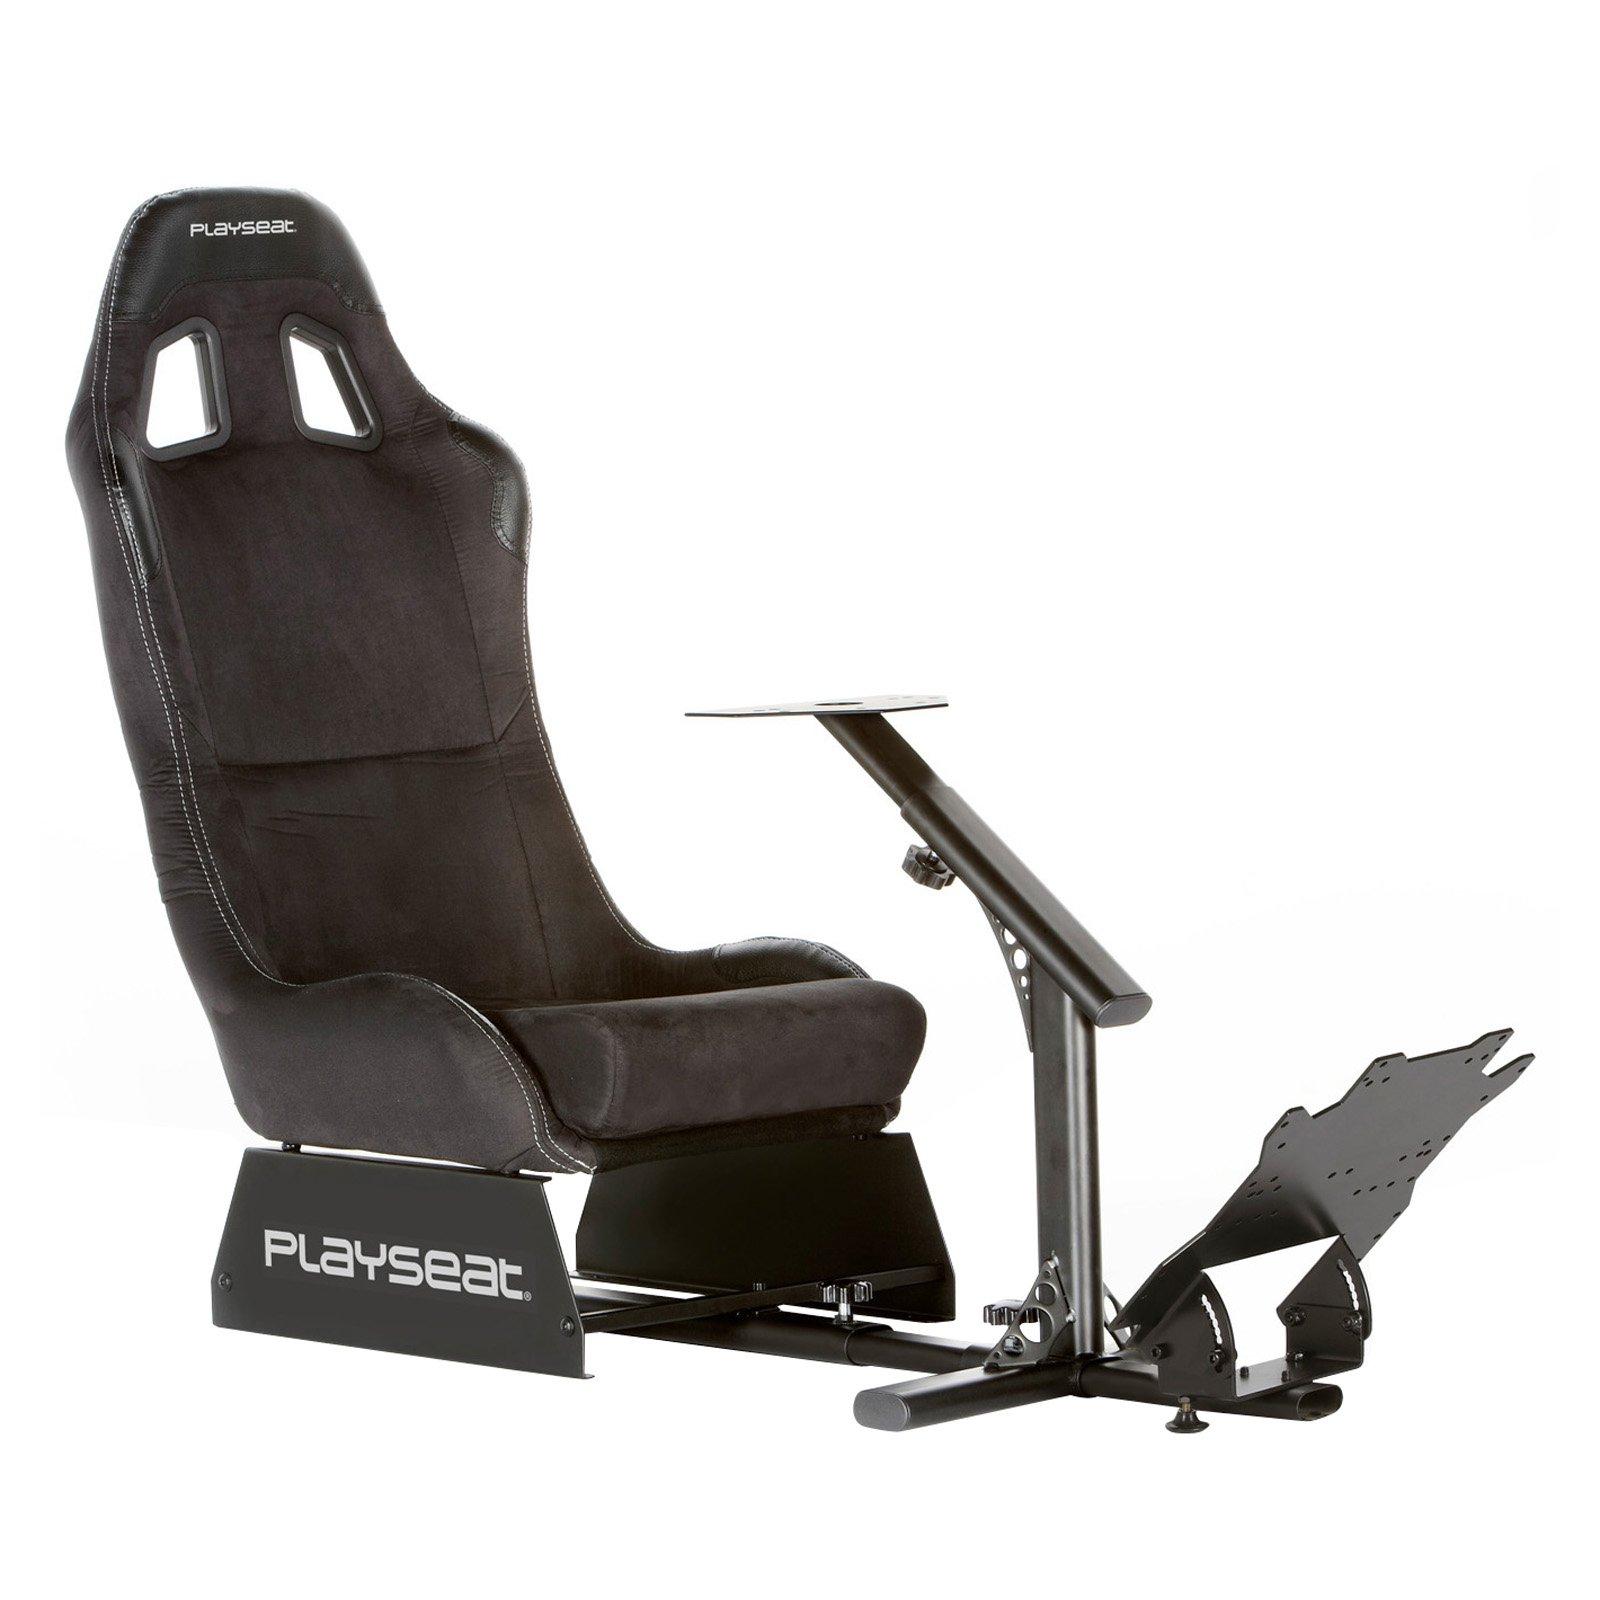 Playseat Evolution Gaming Chair - Black Alcantara with Black Frame